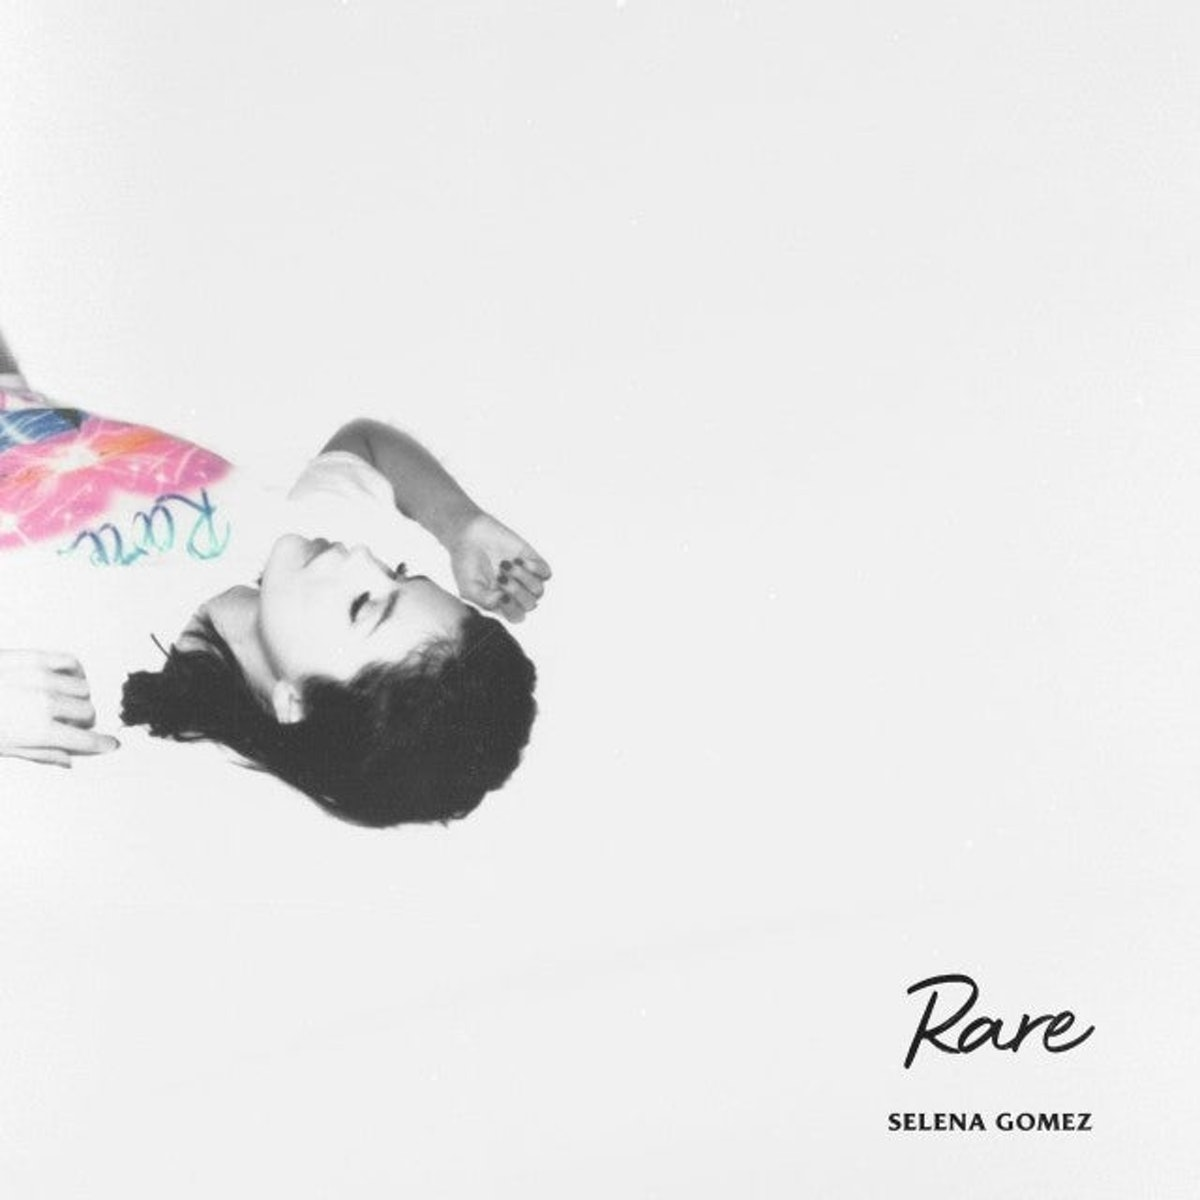 Selena Gomez poses for 'Rare' album cover.